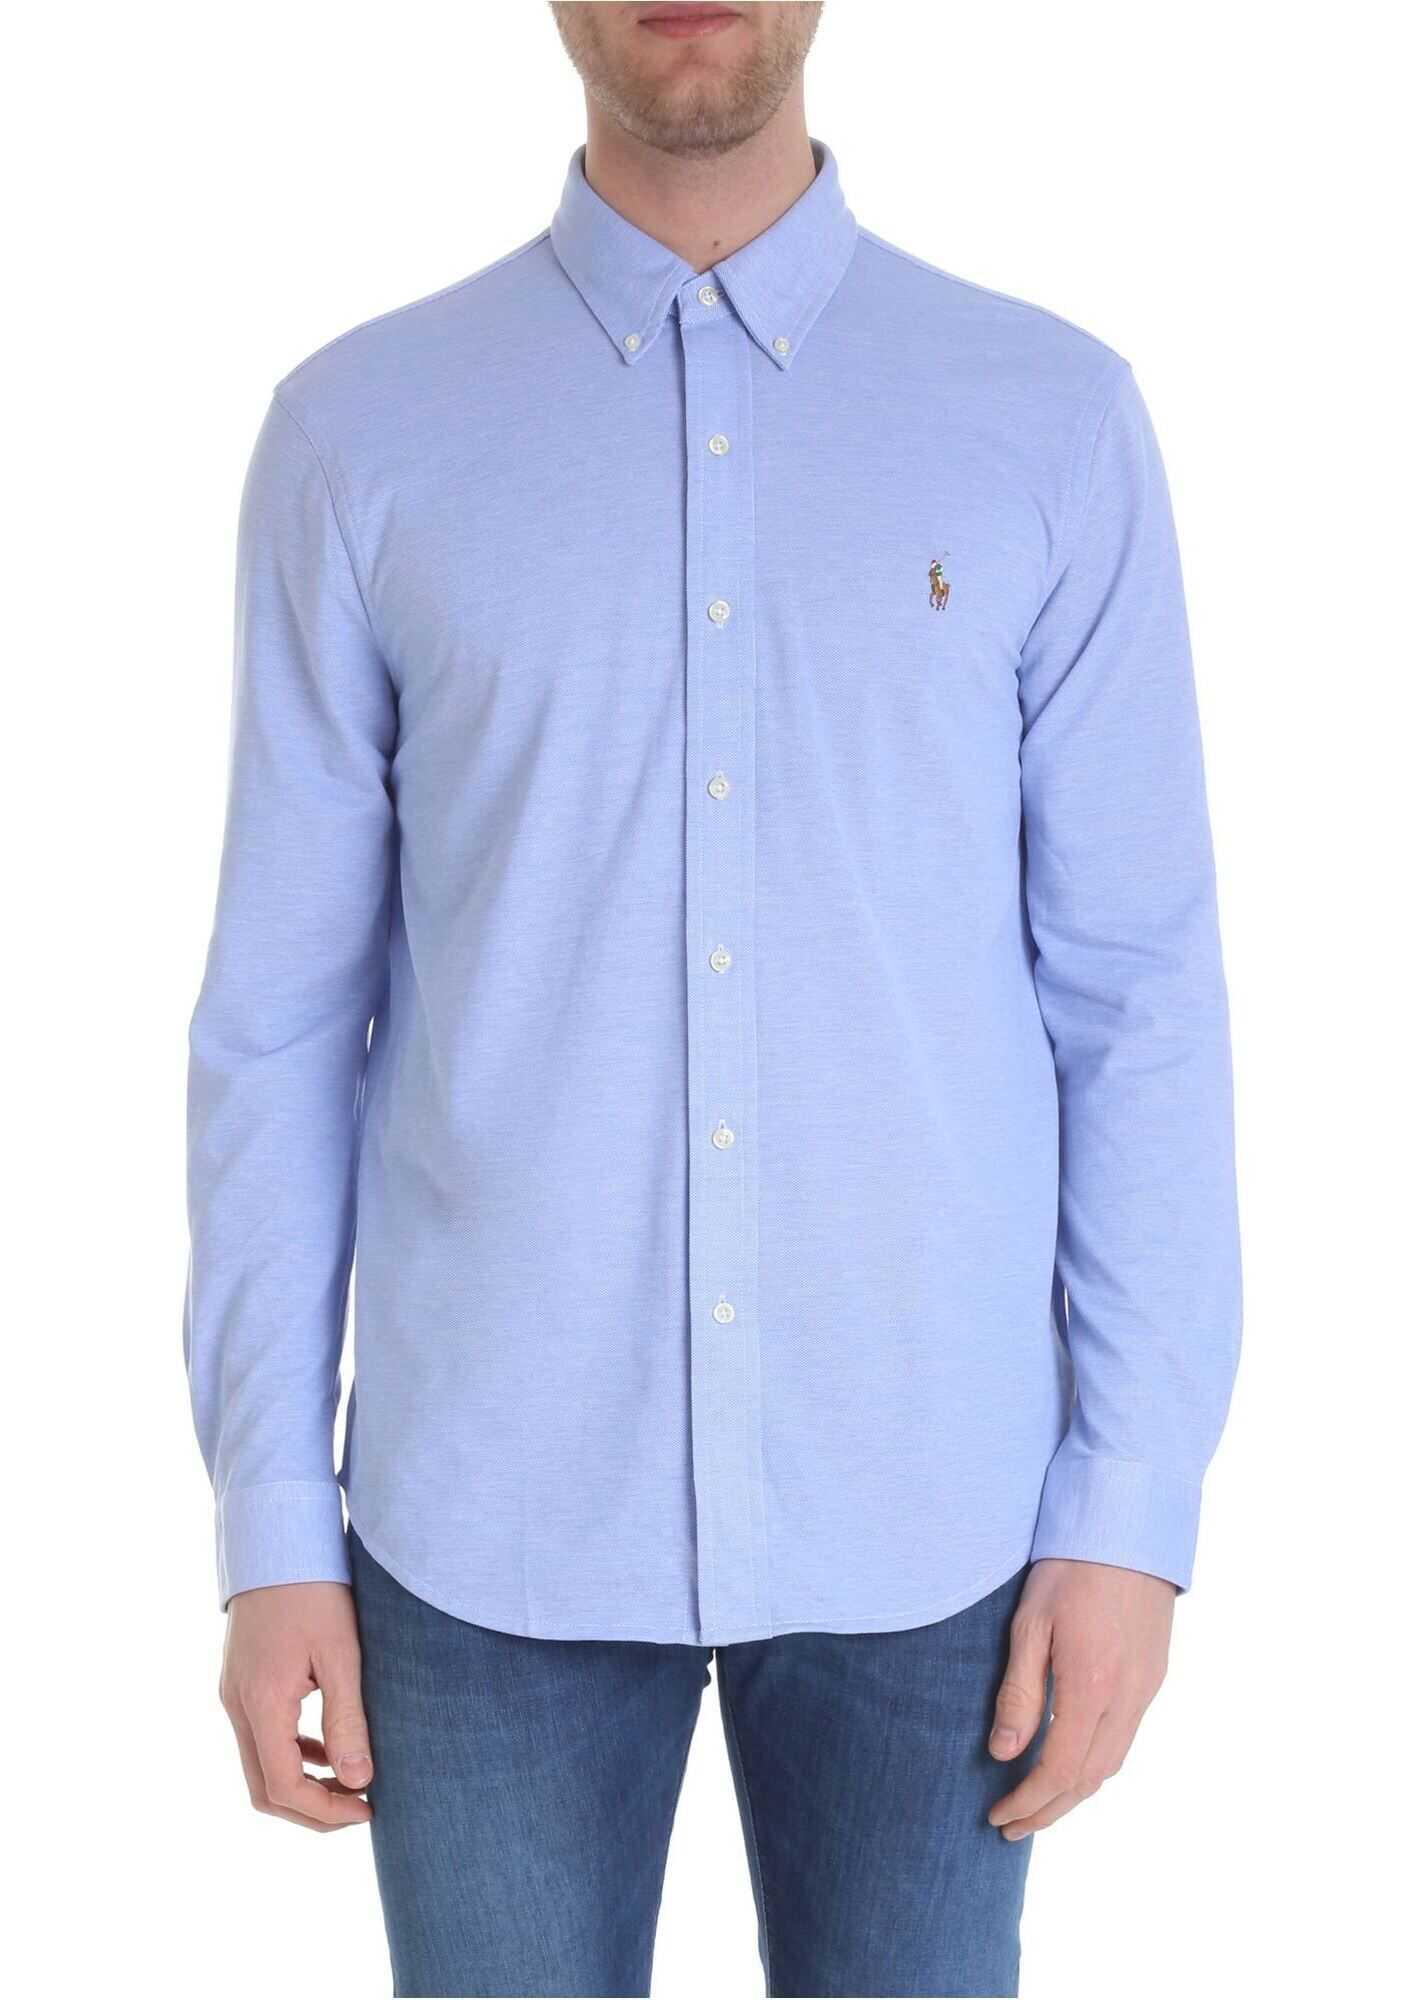 Ralph Lauren Blue And White Oxford Shirt Light Blue imagine